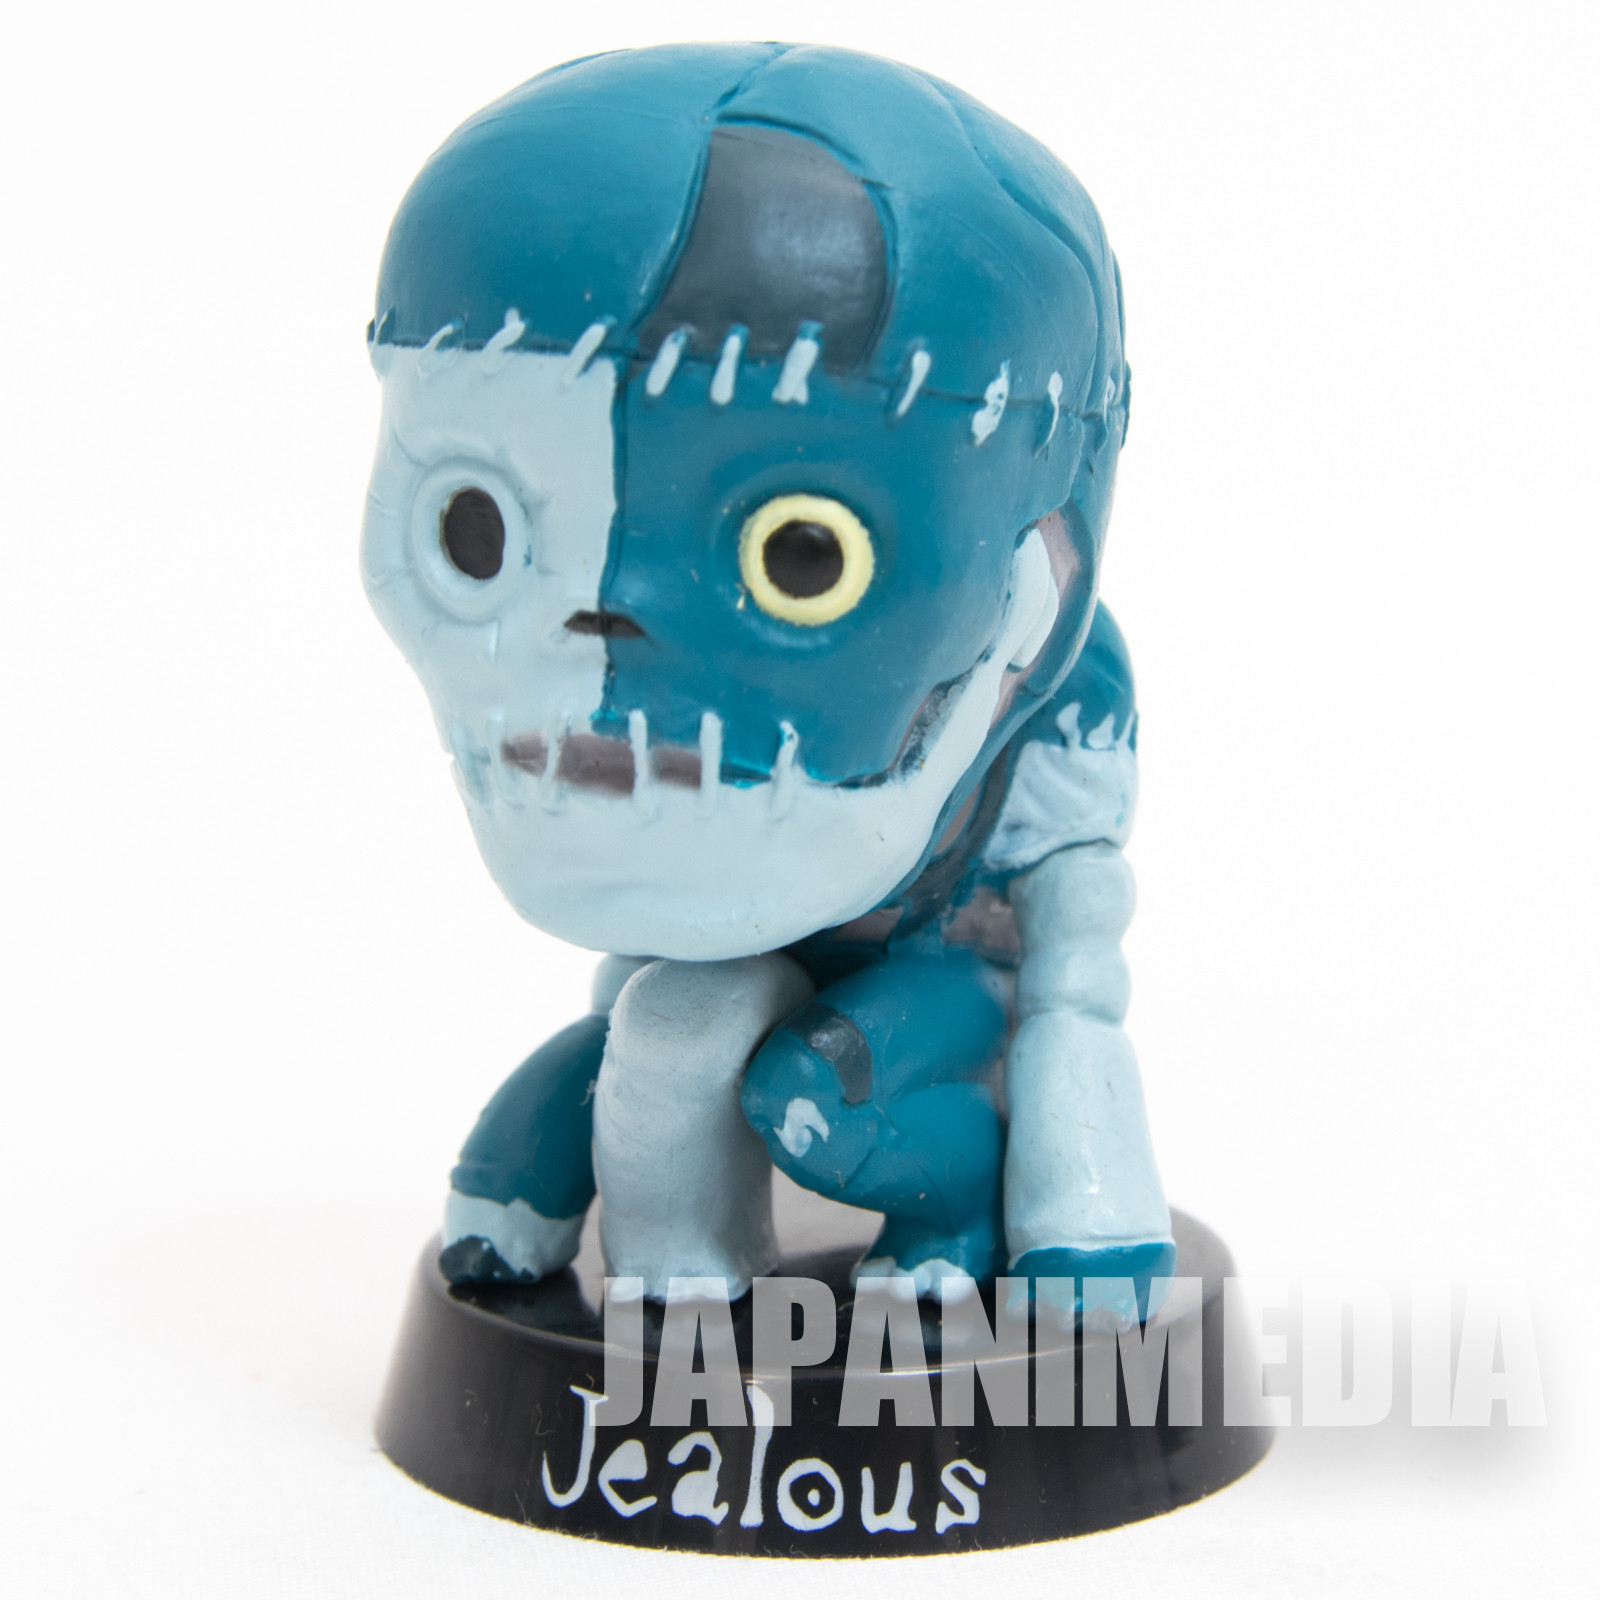 Death Note Jealous Bobble Bobbin Head Figure JAPAN ANIME MANGA